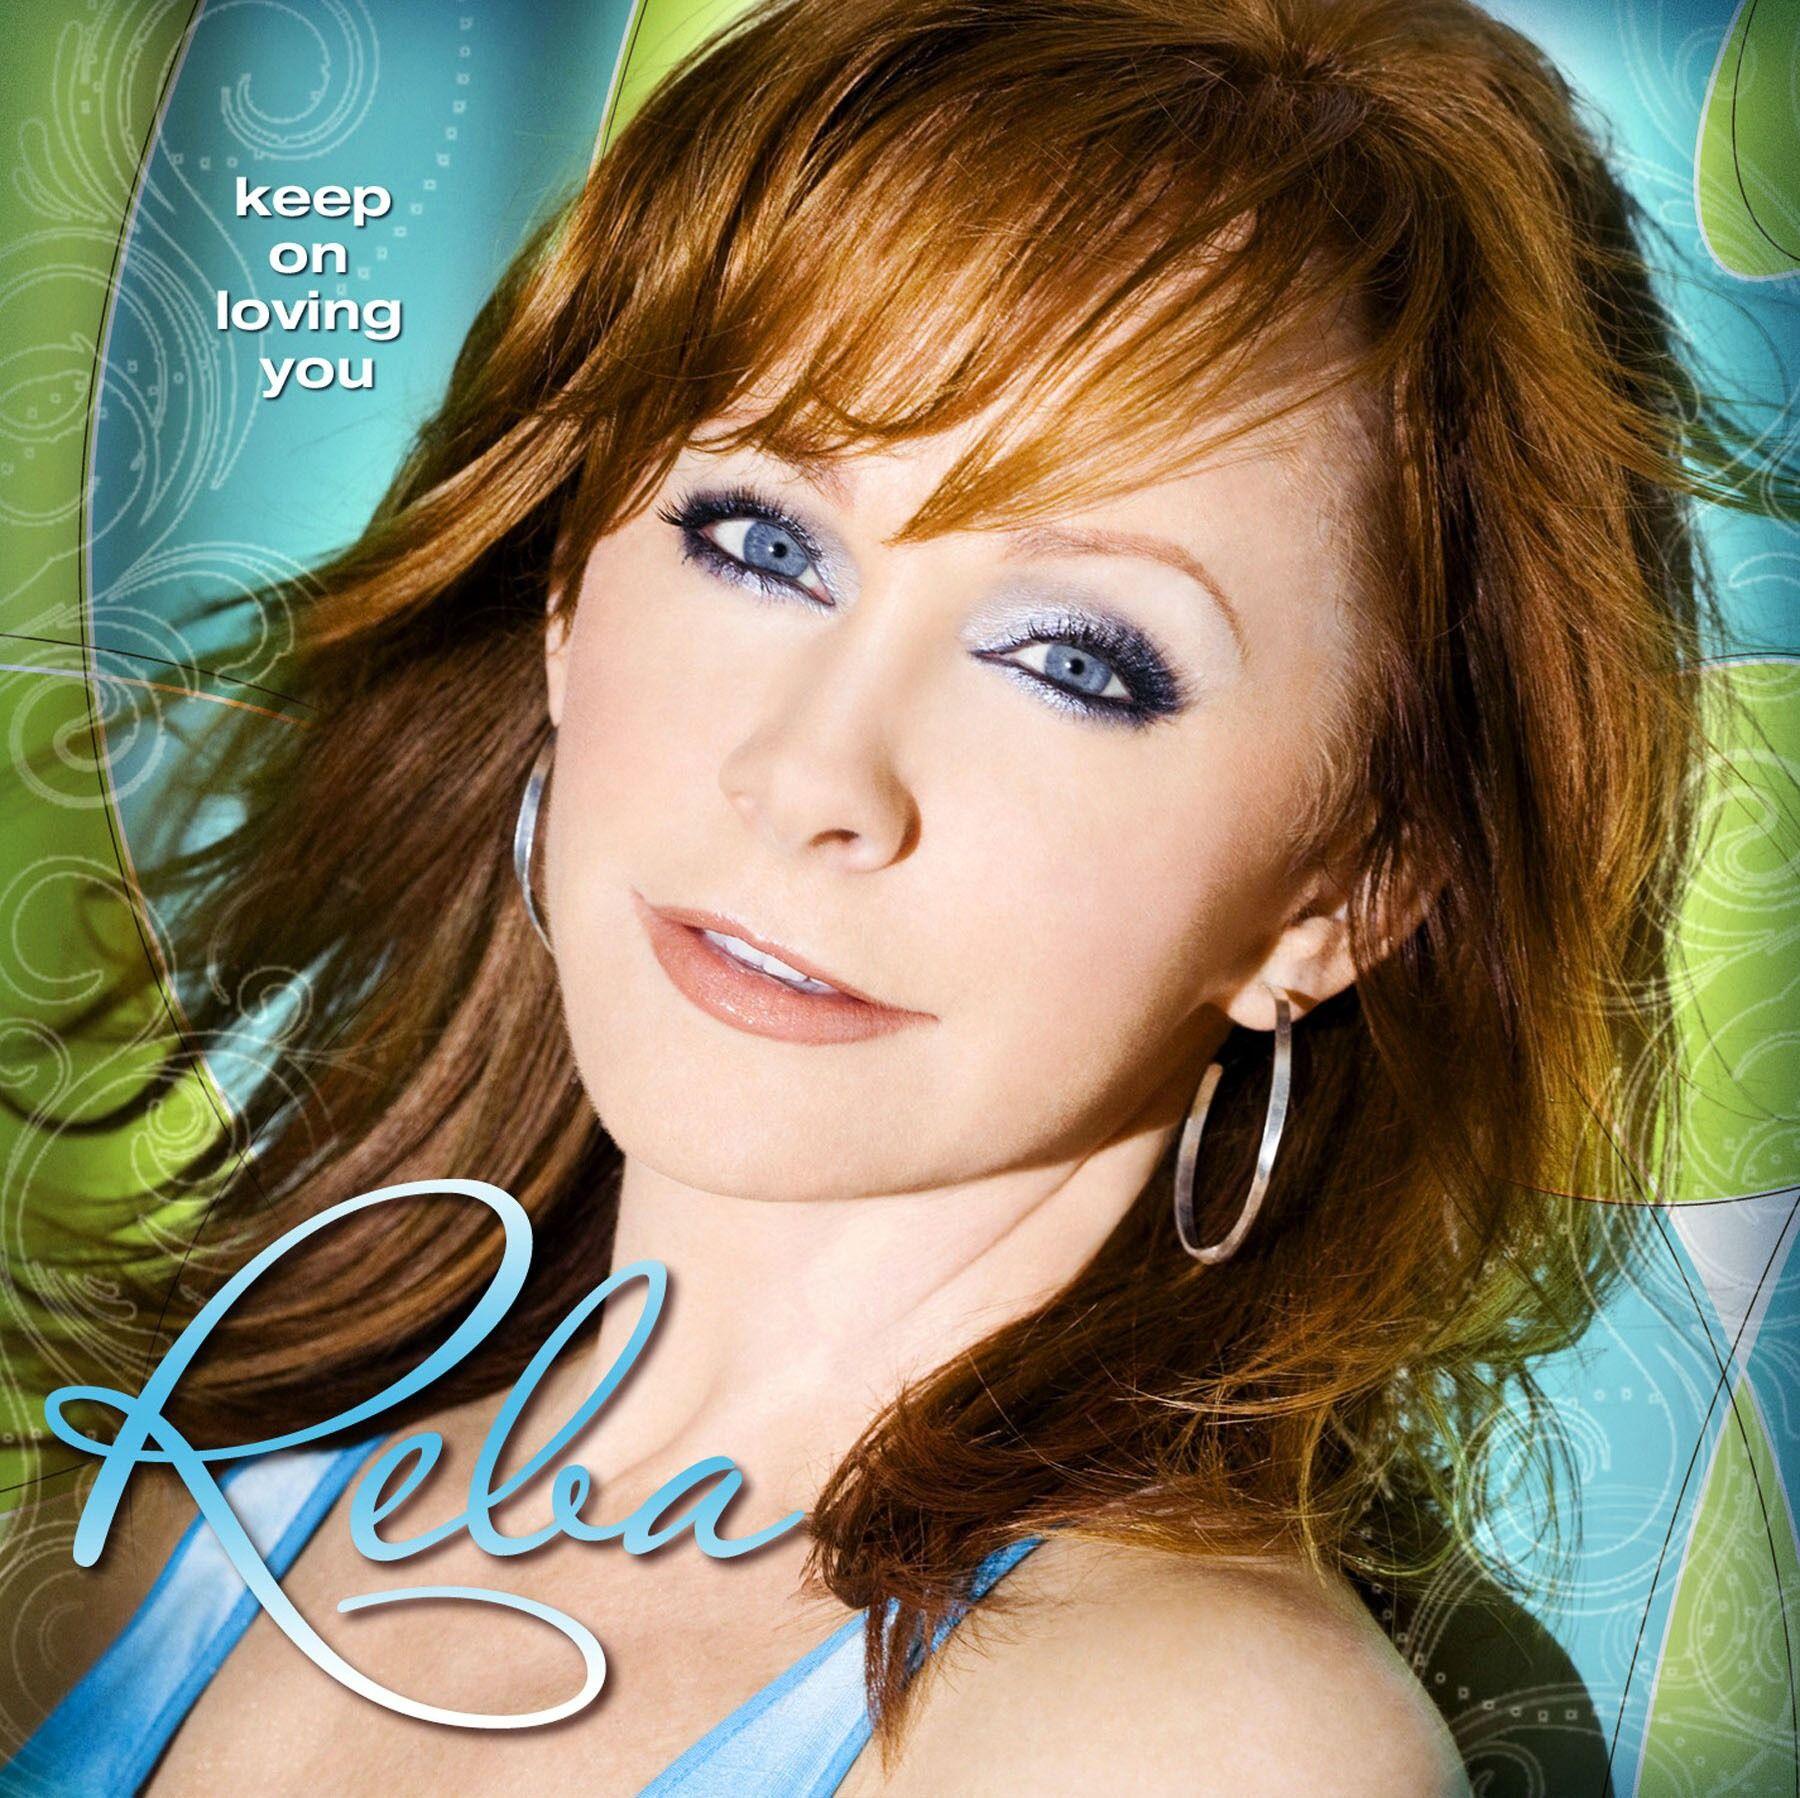 Reba McEntire - Keep On Loving You album cover